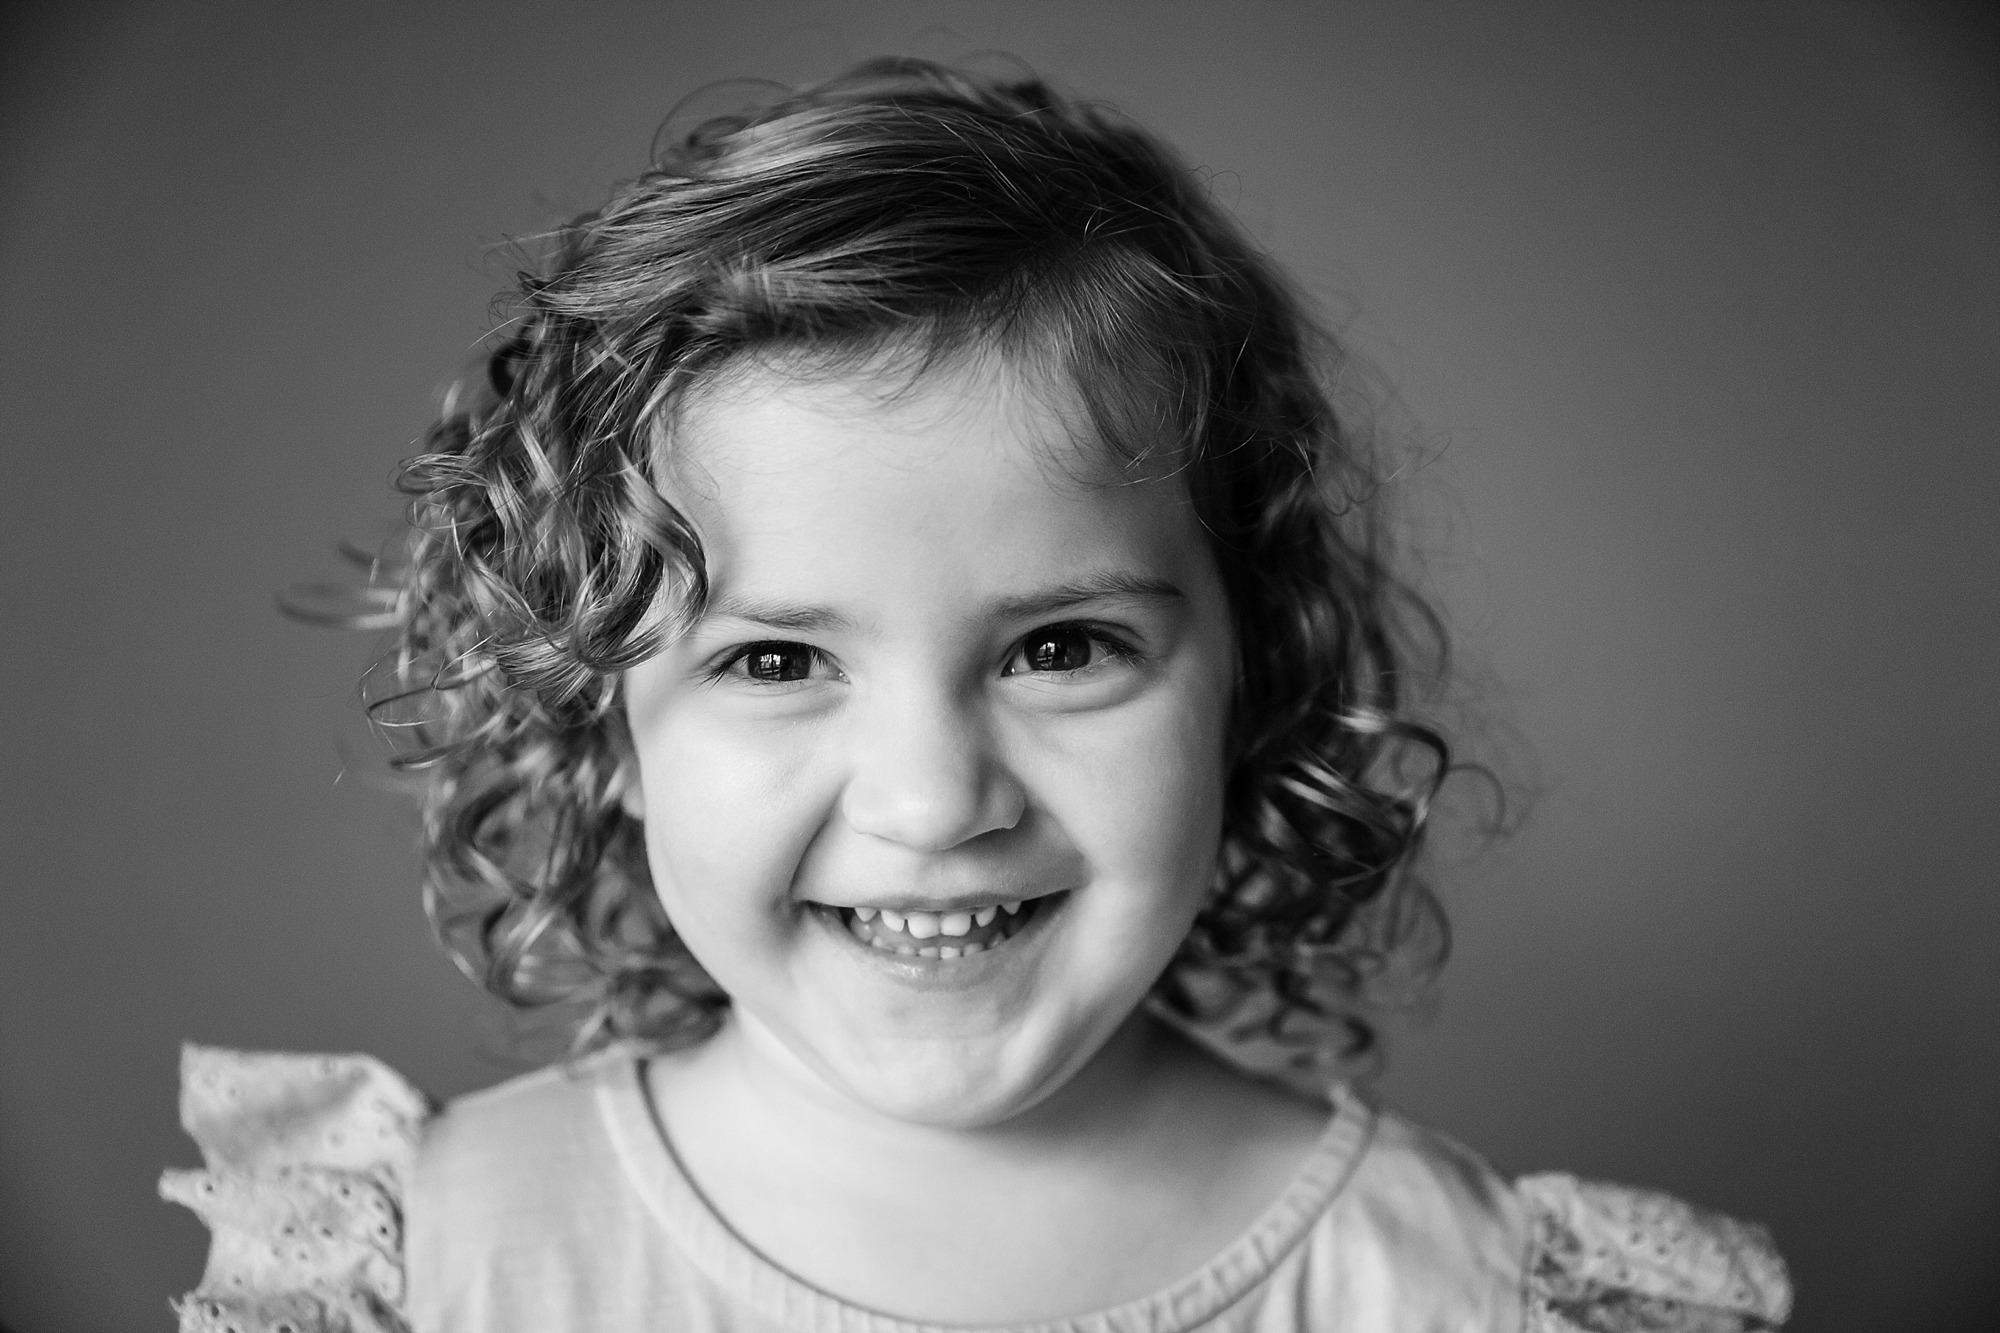 Modern_Childrens_Portraits_Hunnicutt_Photography_Collages_0011